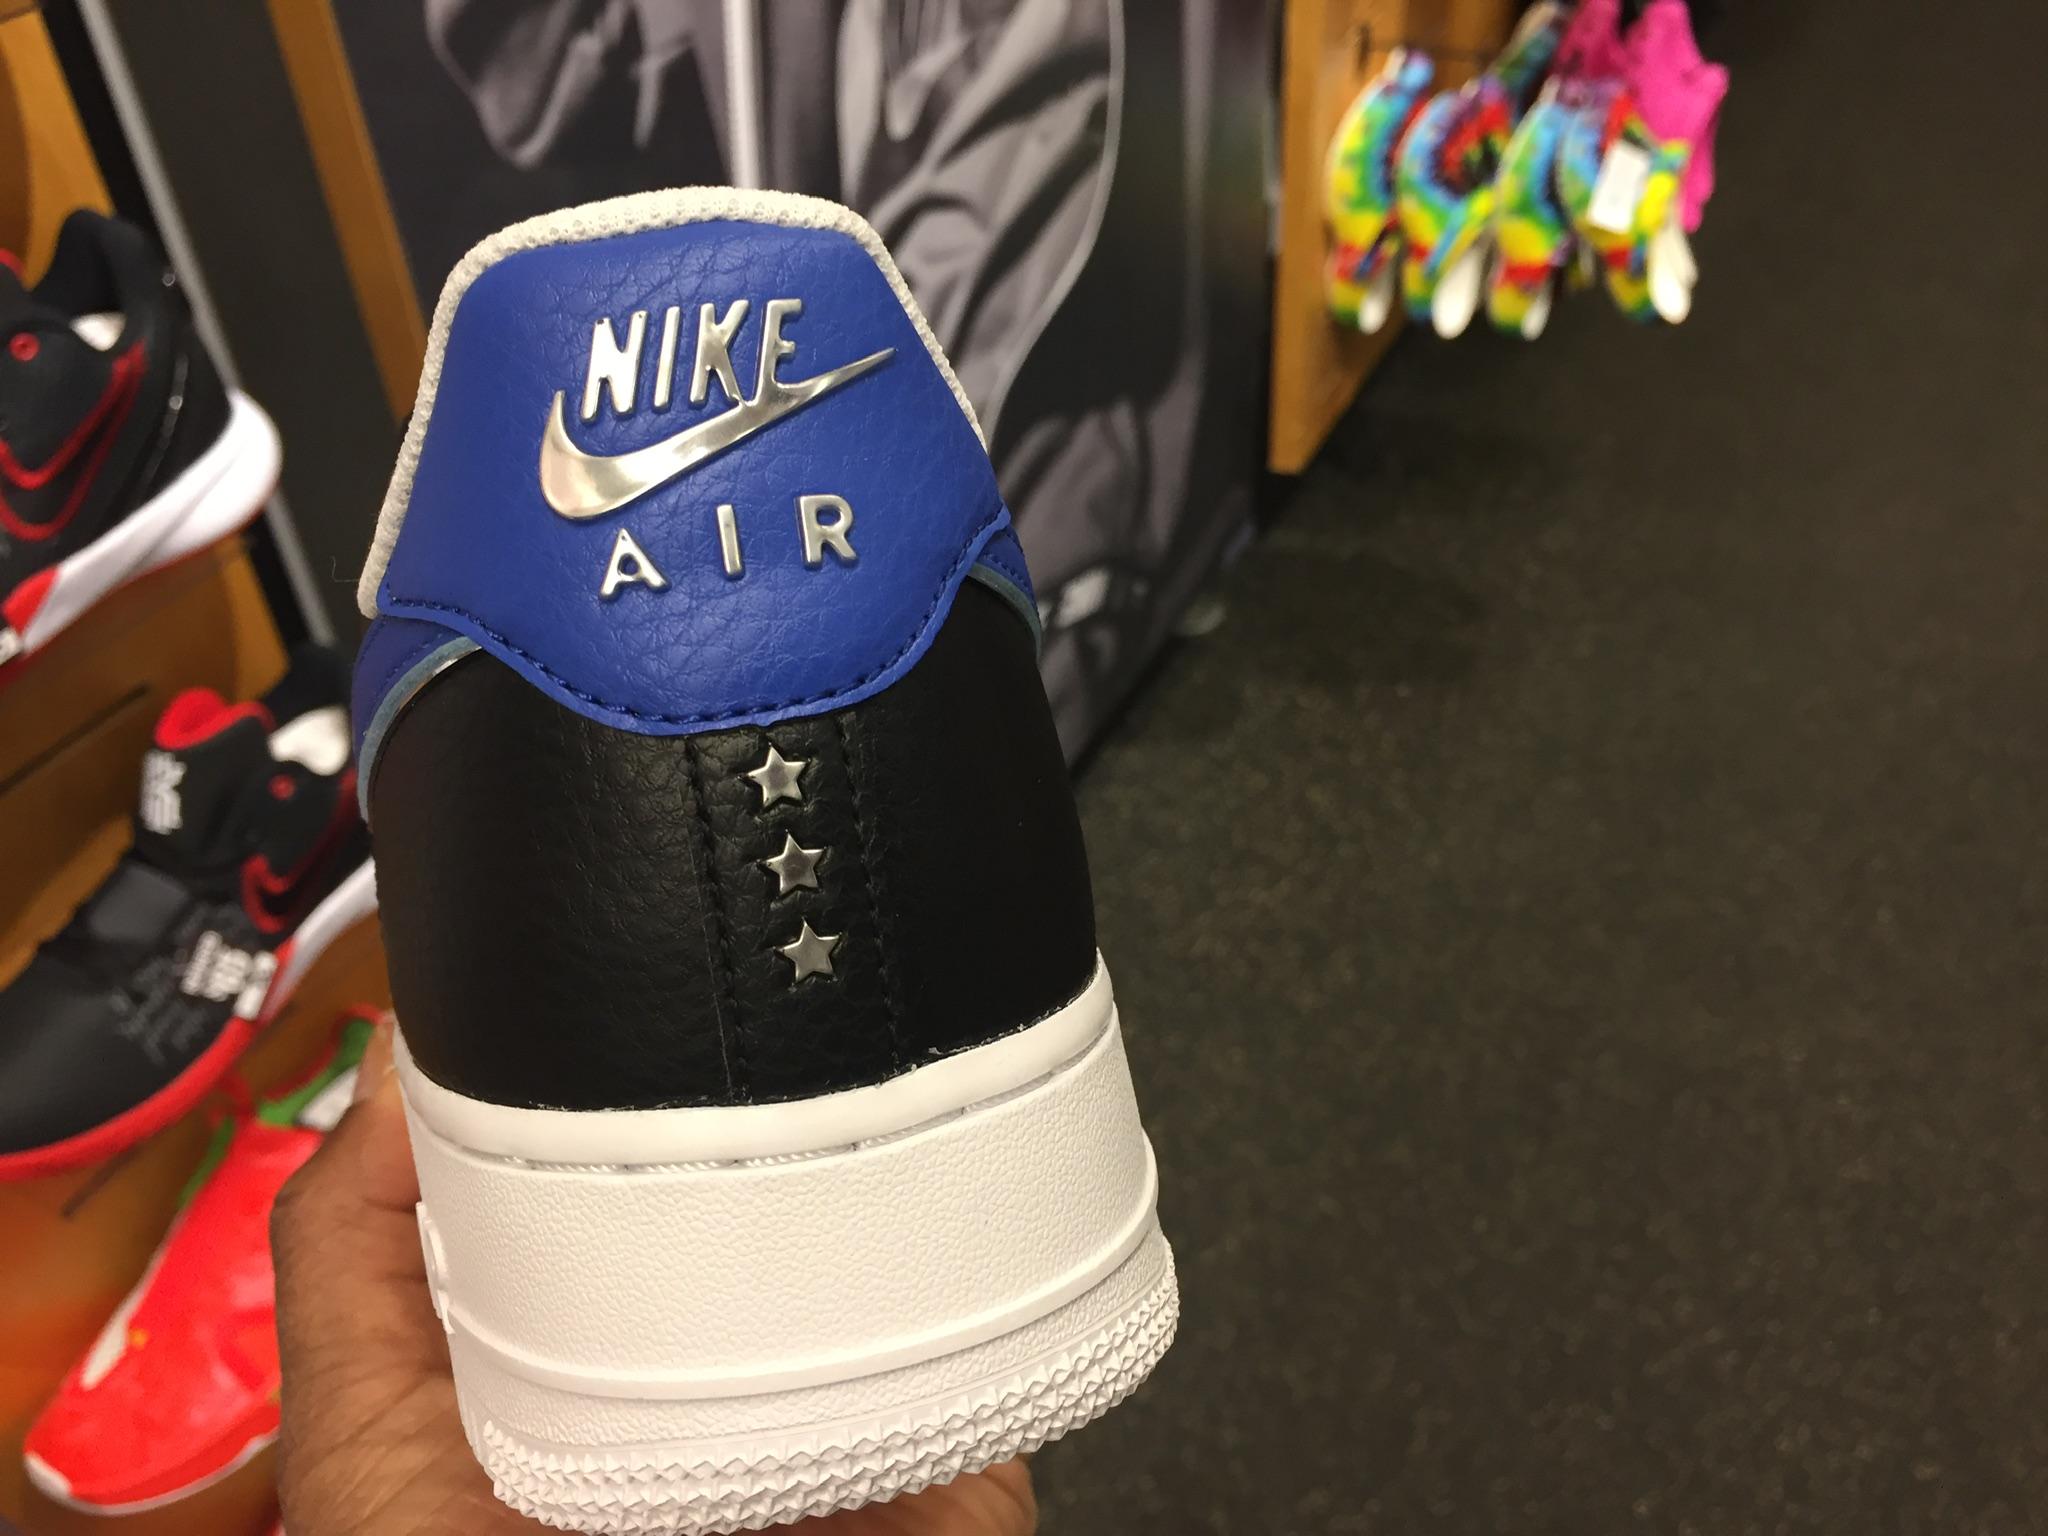 Nike Air Force 1 Shooting Stars DD9784-001 & Buy It now